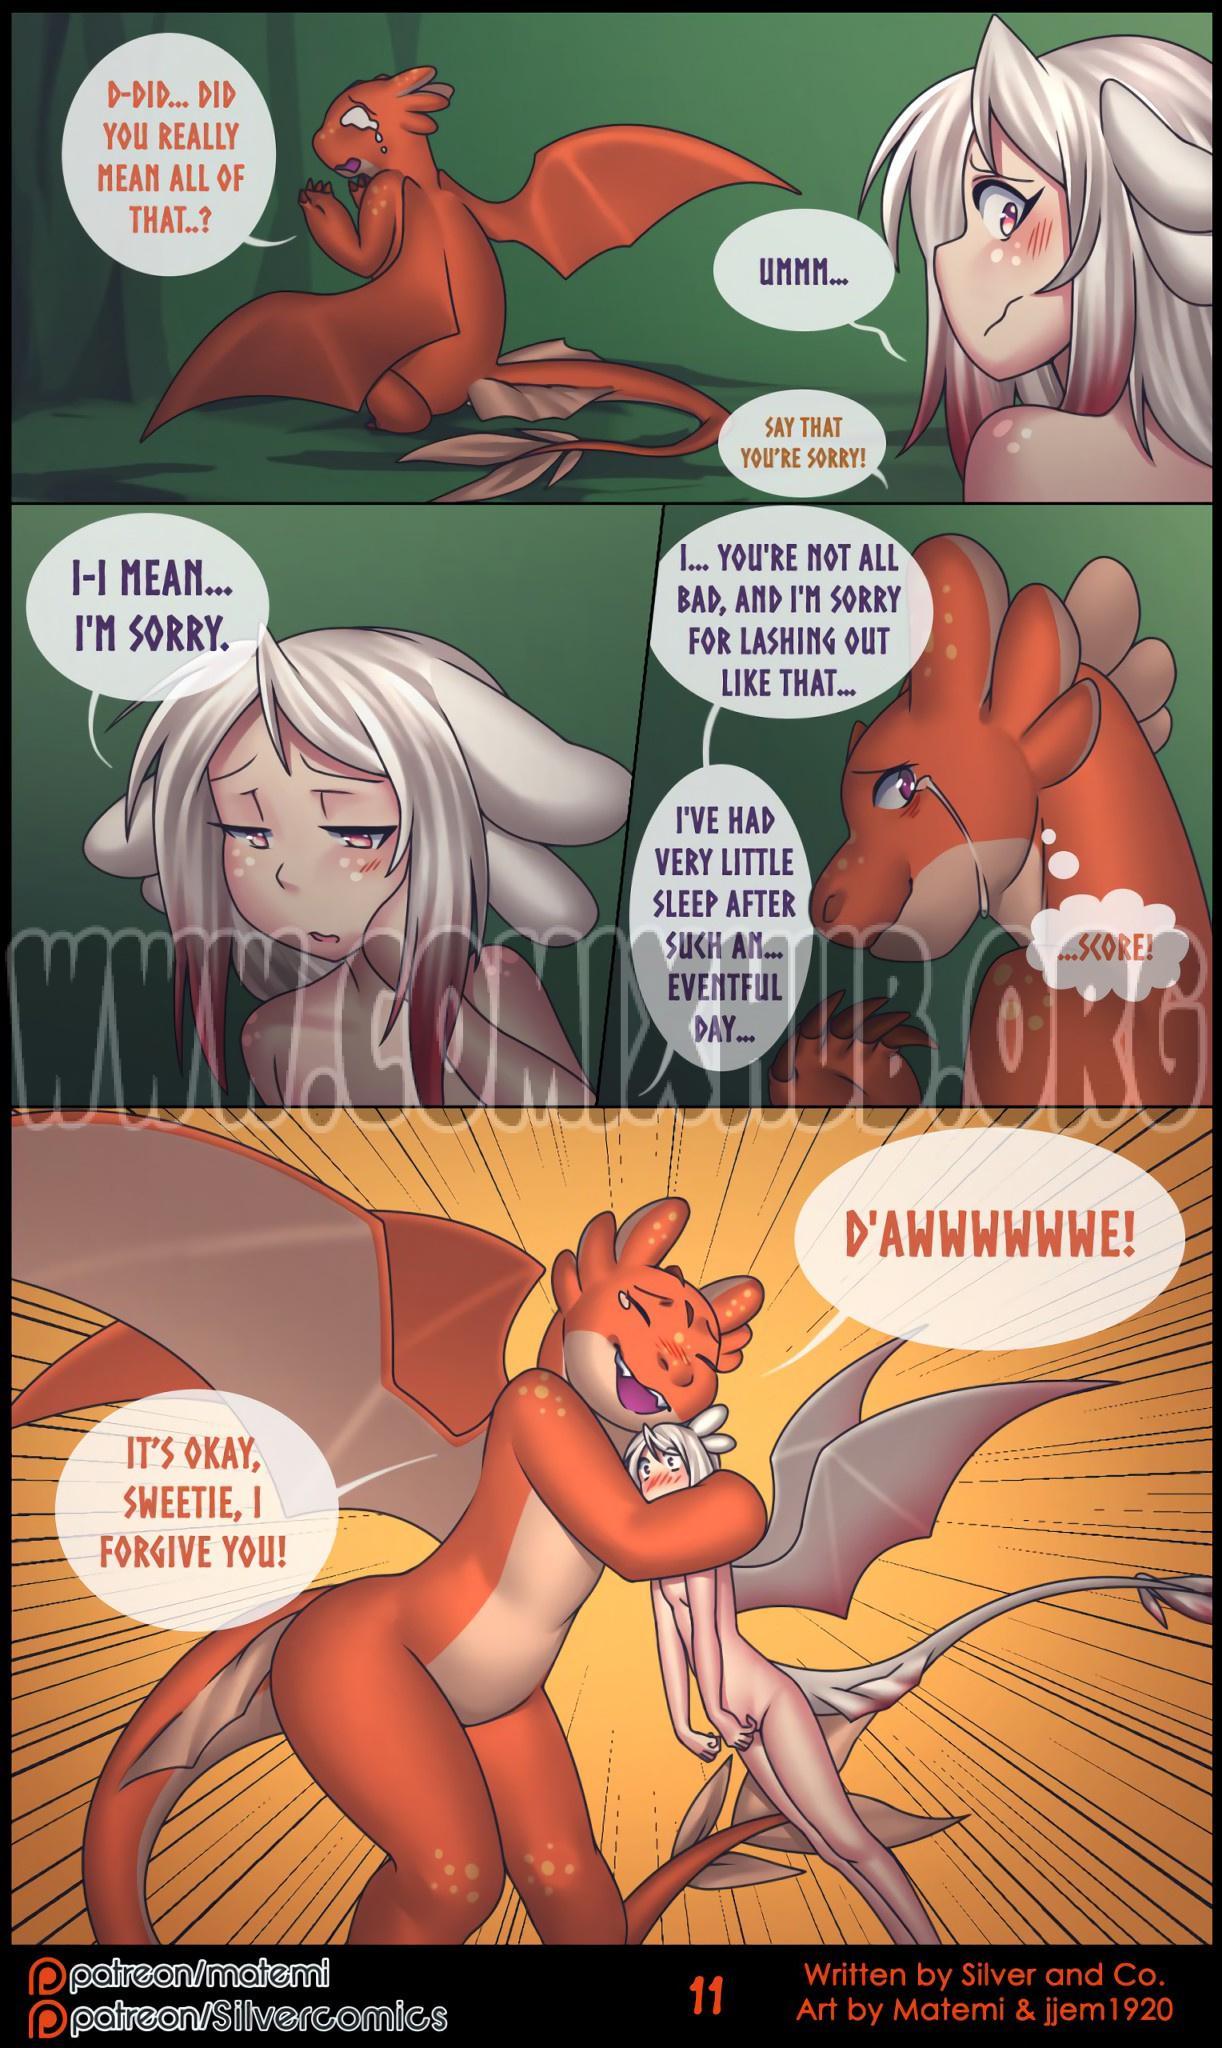 Rise of Dragons porn comics Oral sex, Blowjob, cunnilingus, Furry, Straight, X-Ray